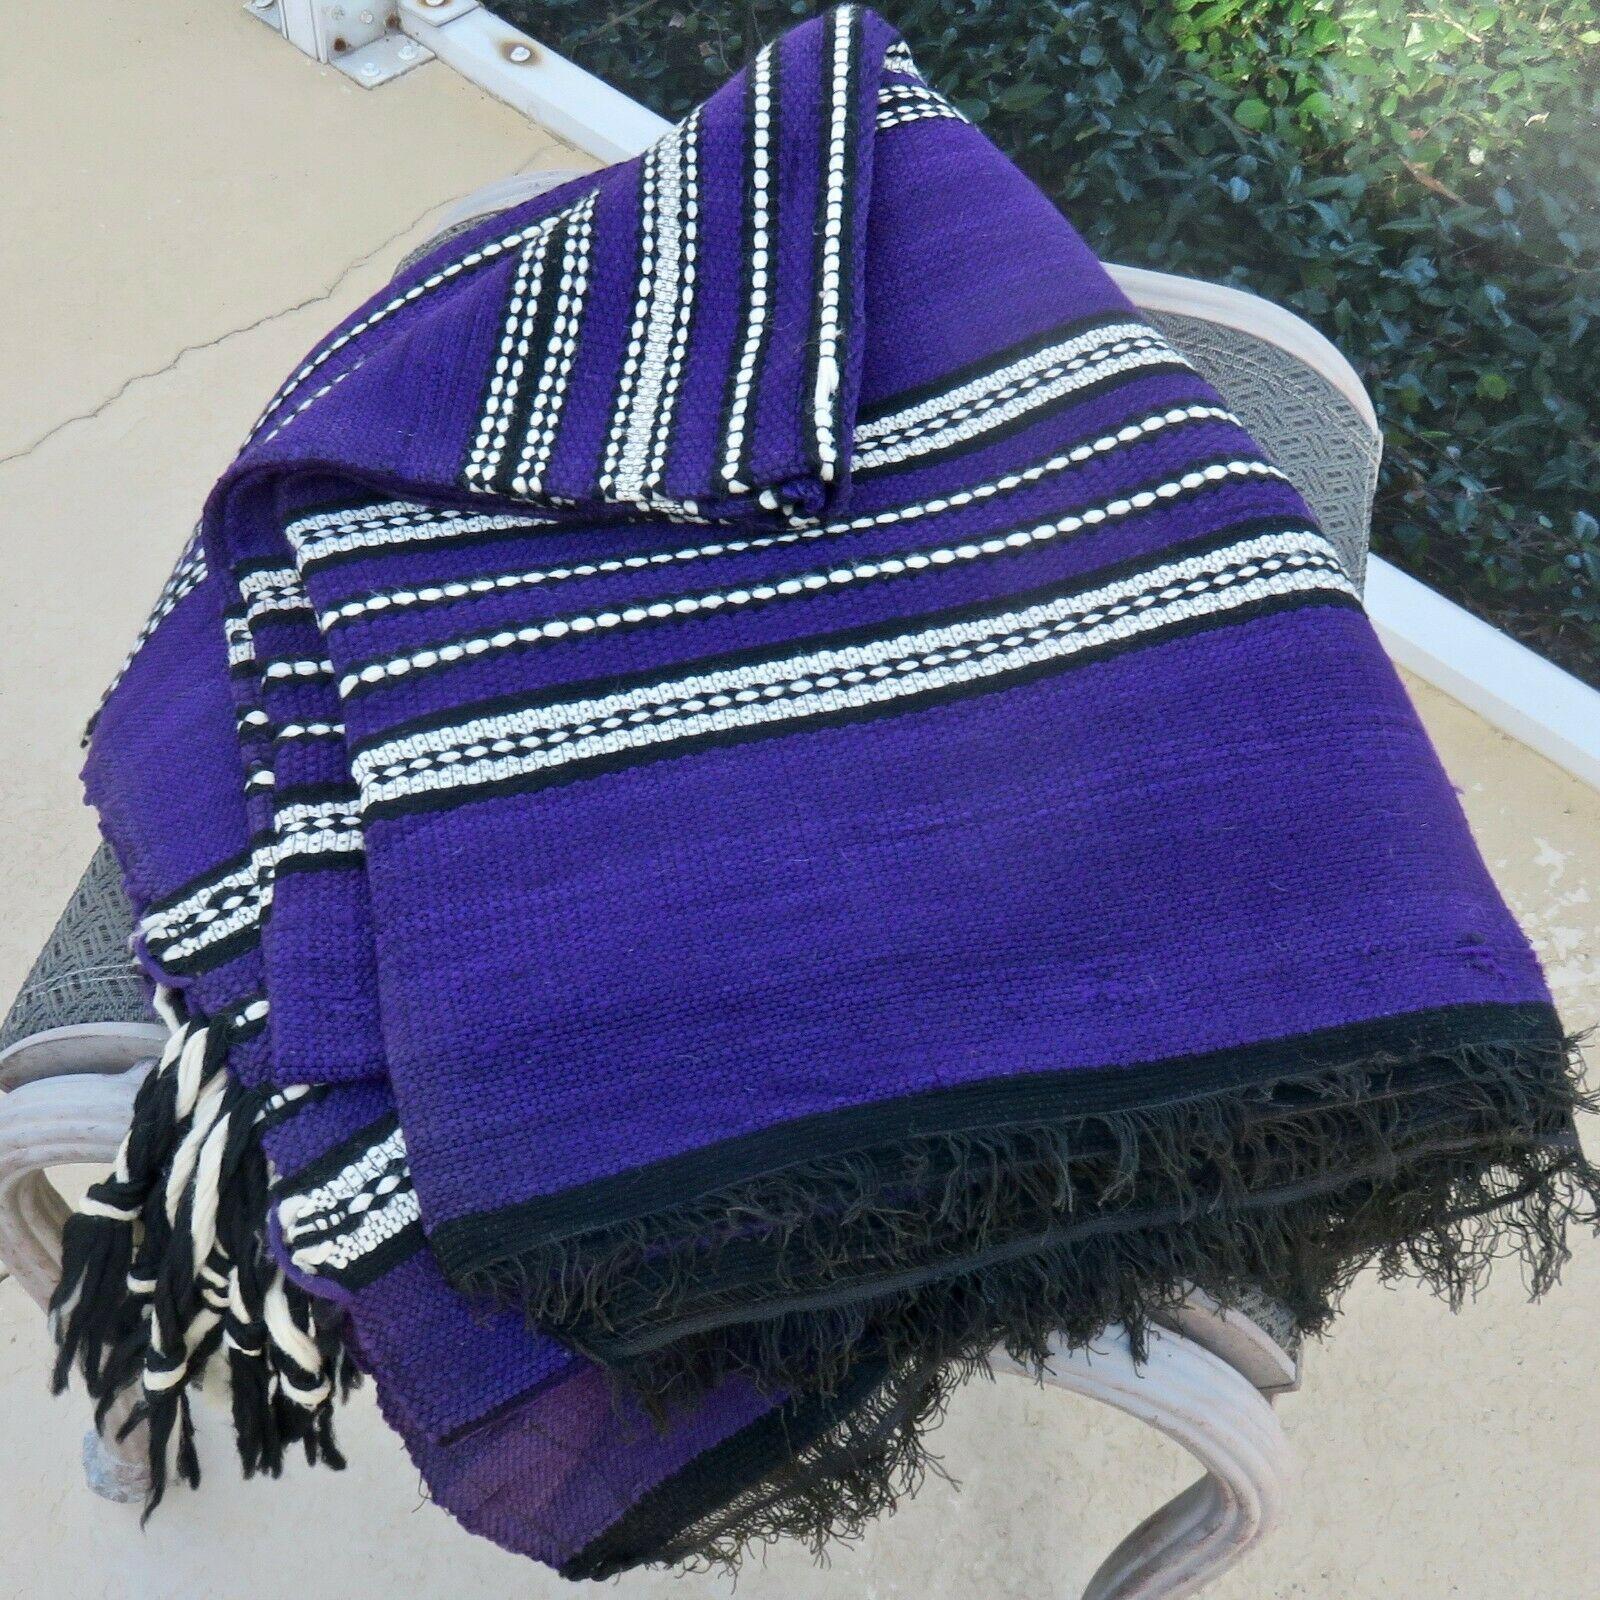 Vintage Handwoven Textile Blanket Rug 100 Wool Purple Black White 94 X 67 Hand Woven Textiles Hand Weaving Hand Woven Blanket